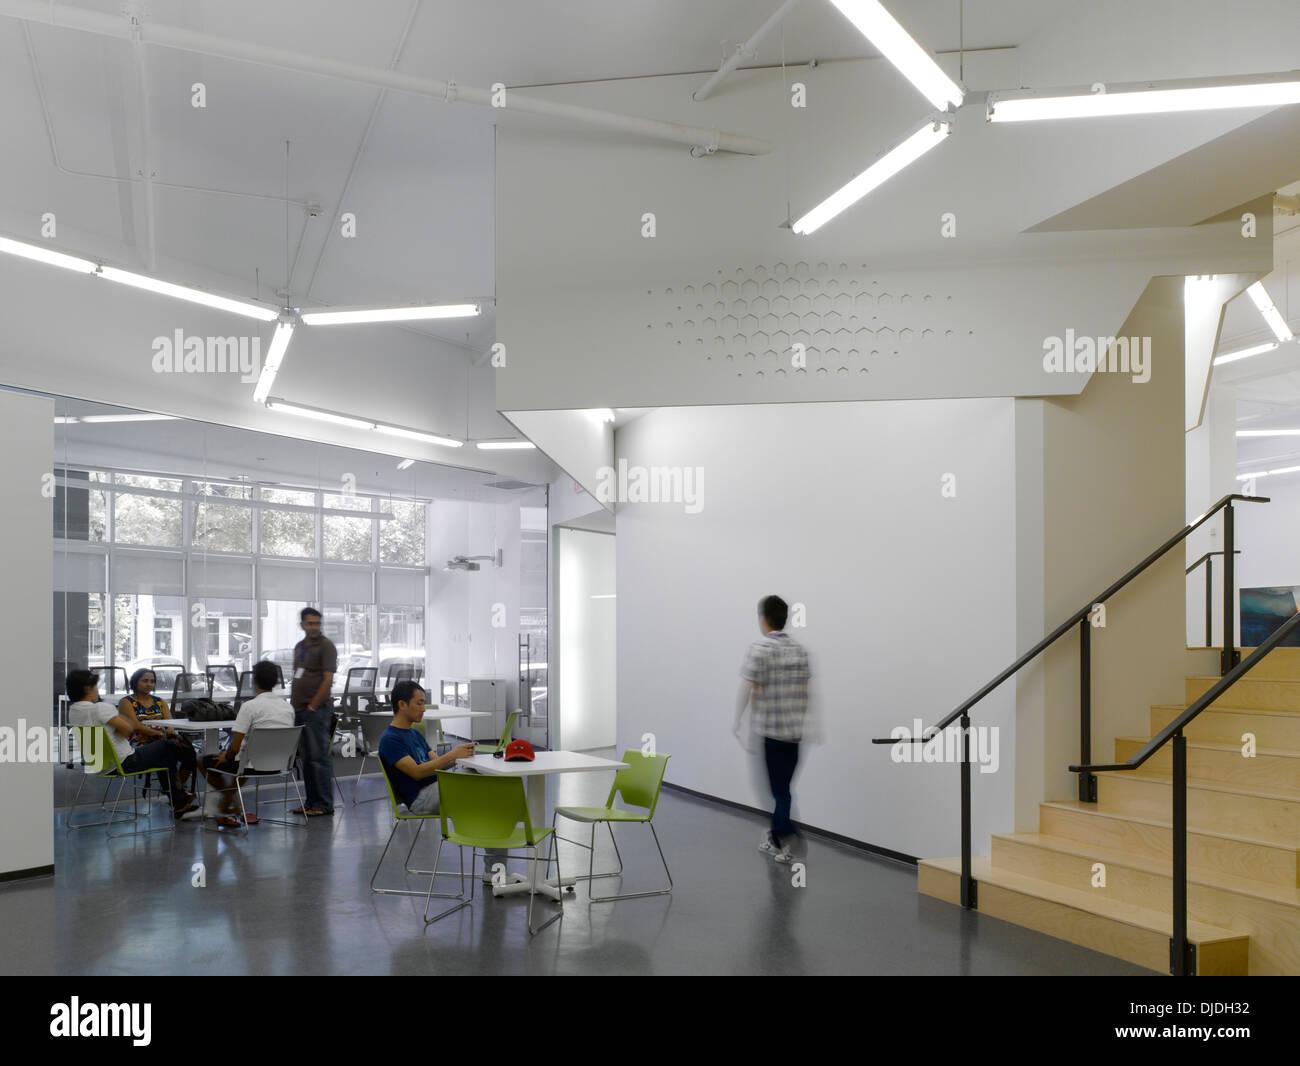 Manitoba Start, Winnipeg, Canada. Architect: 5468796 Architecture, 2013. Community room. Stock Photo